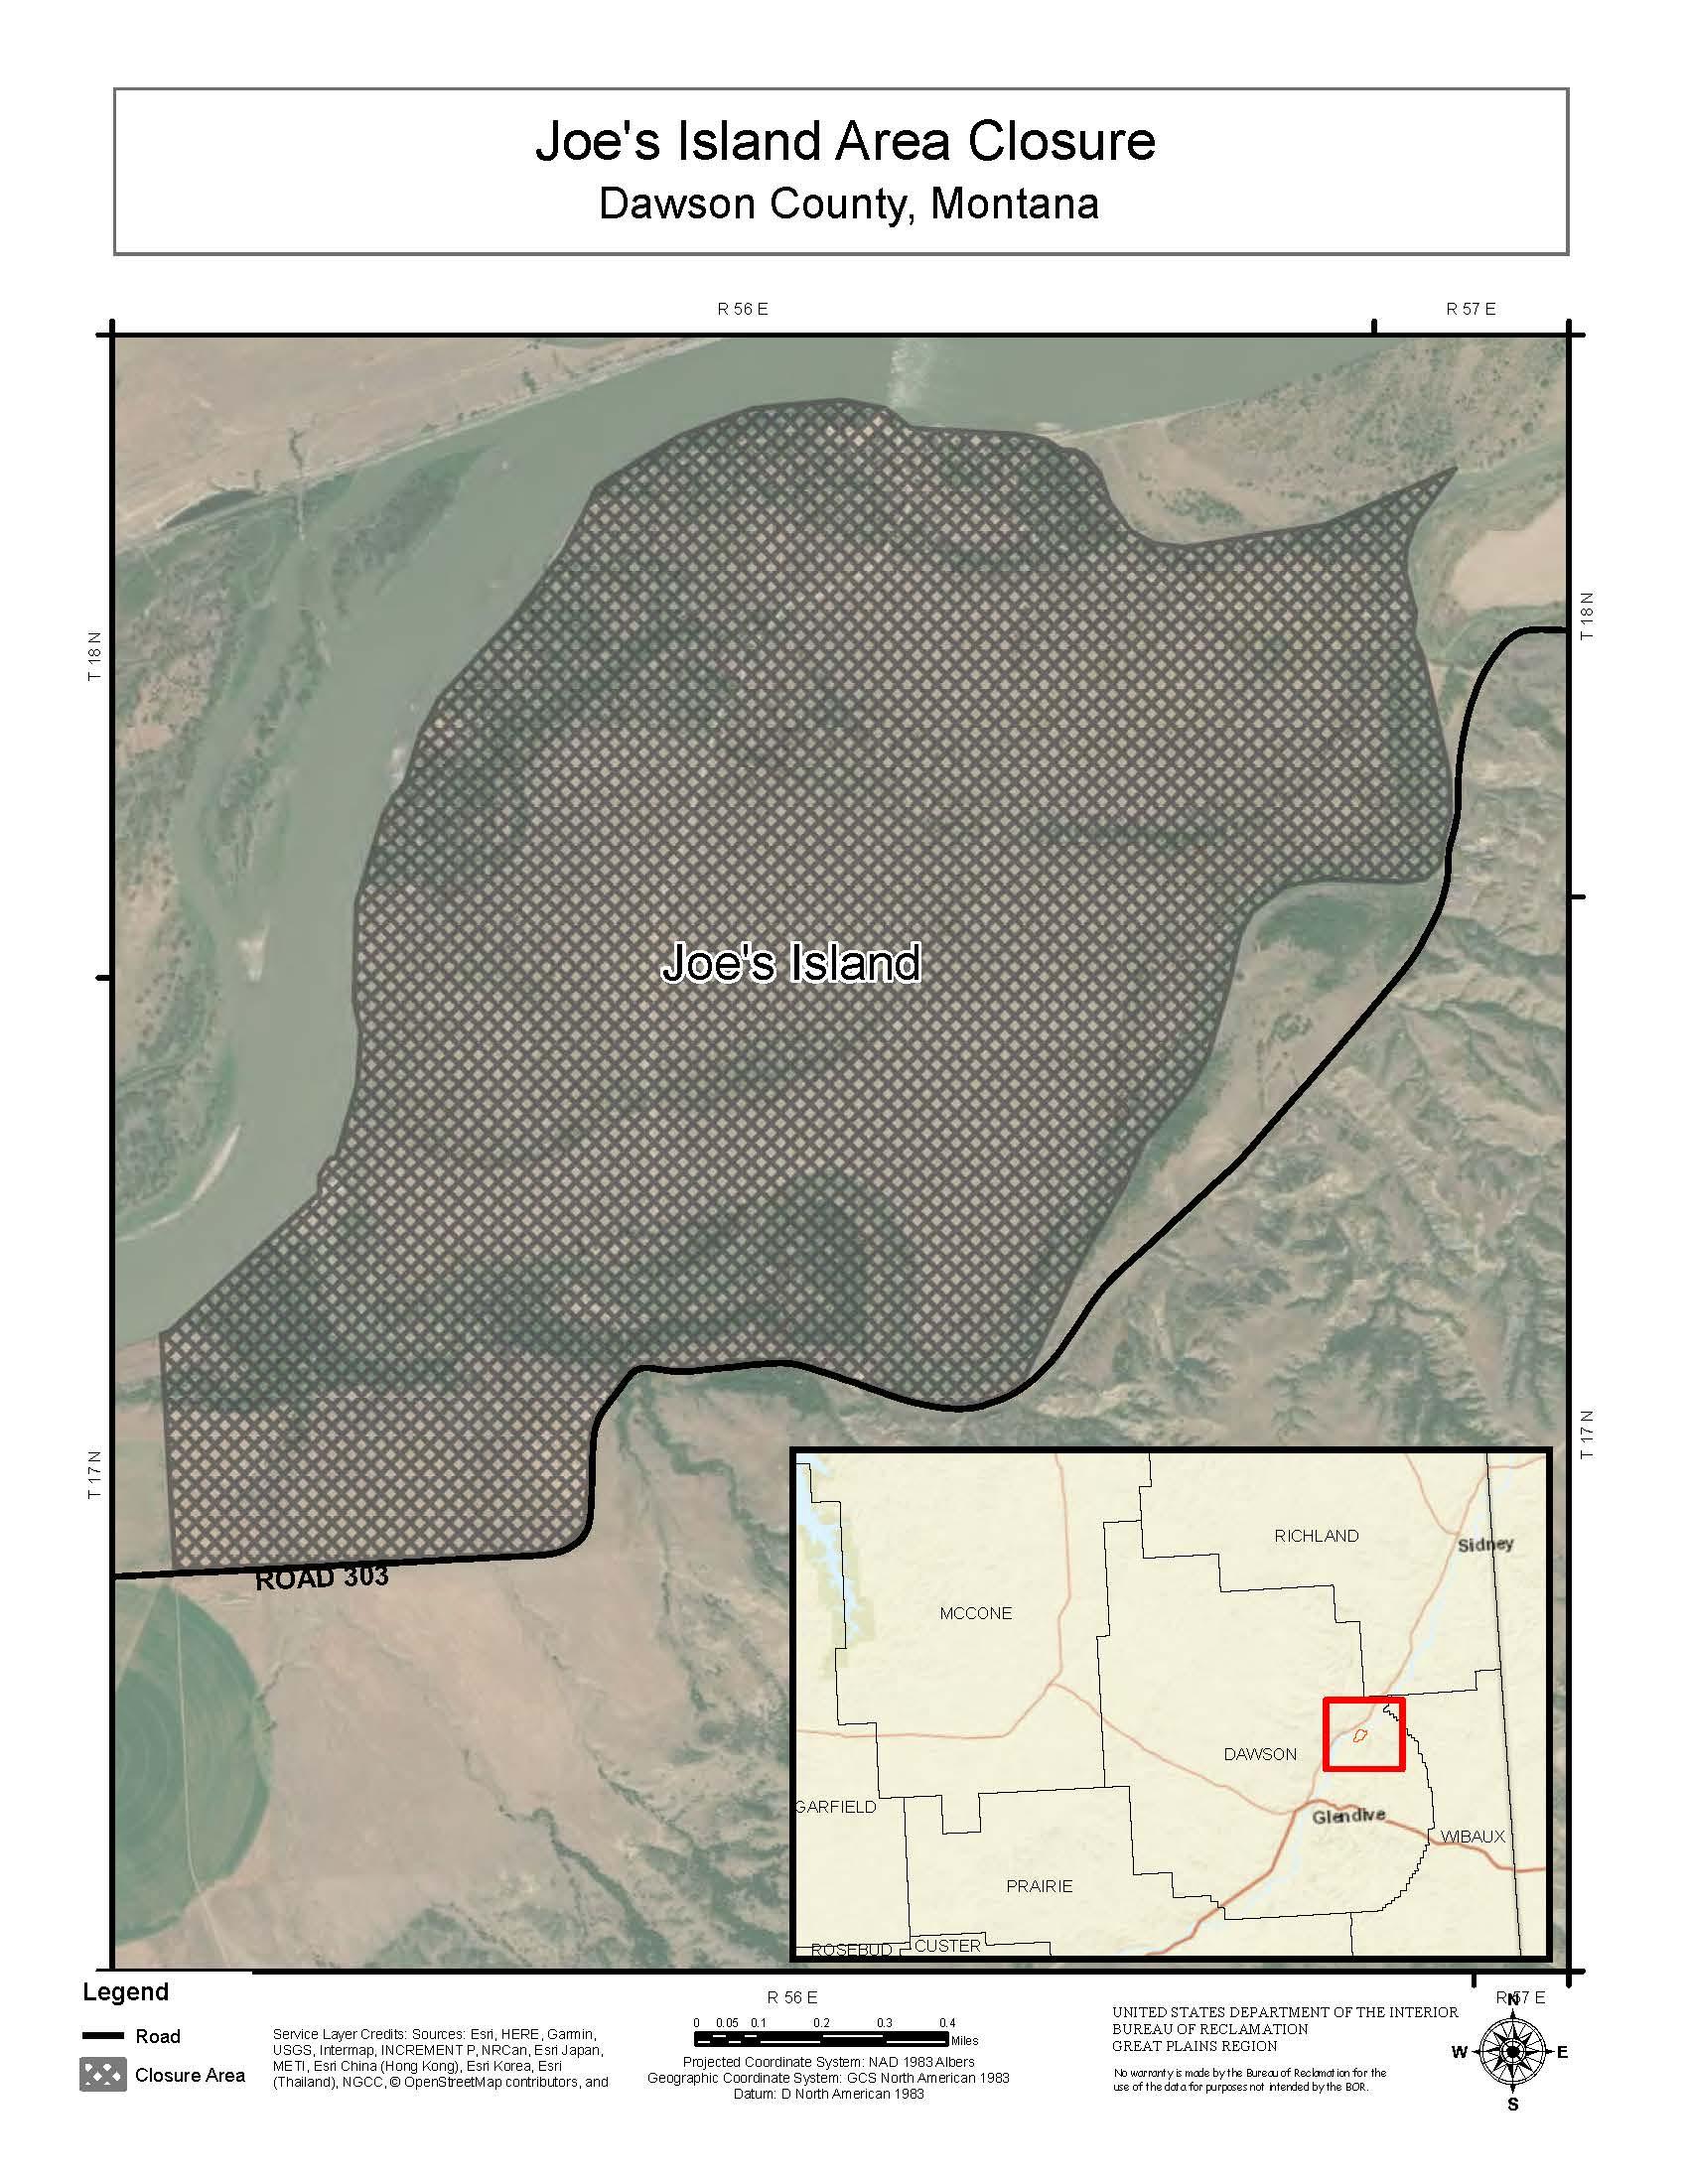 Aerial map of closure near Joe's Island